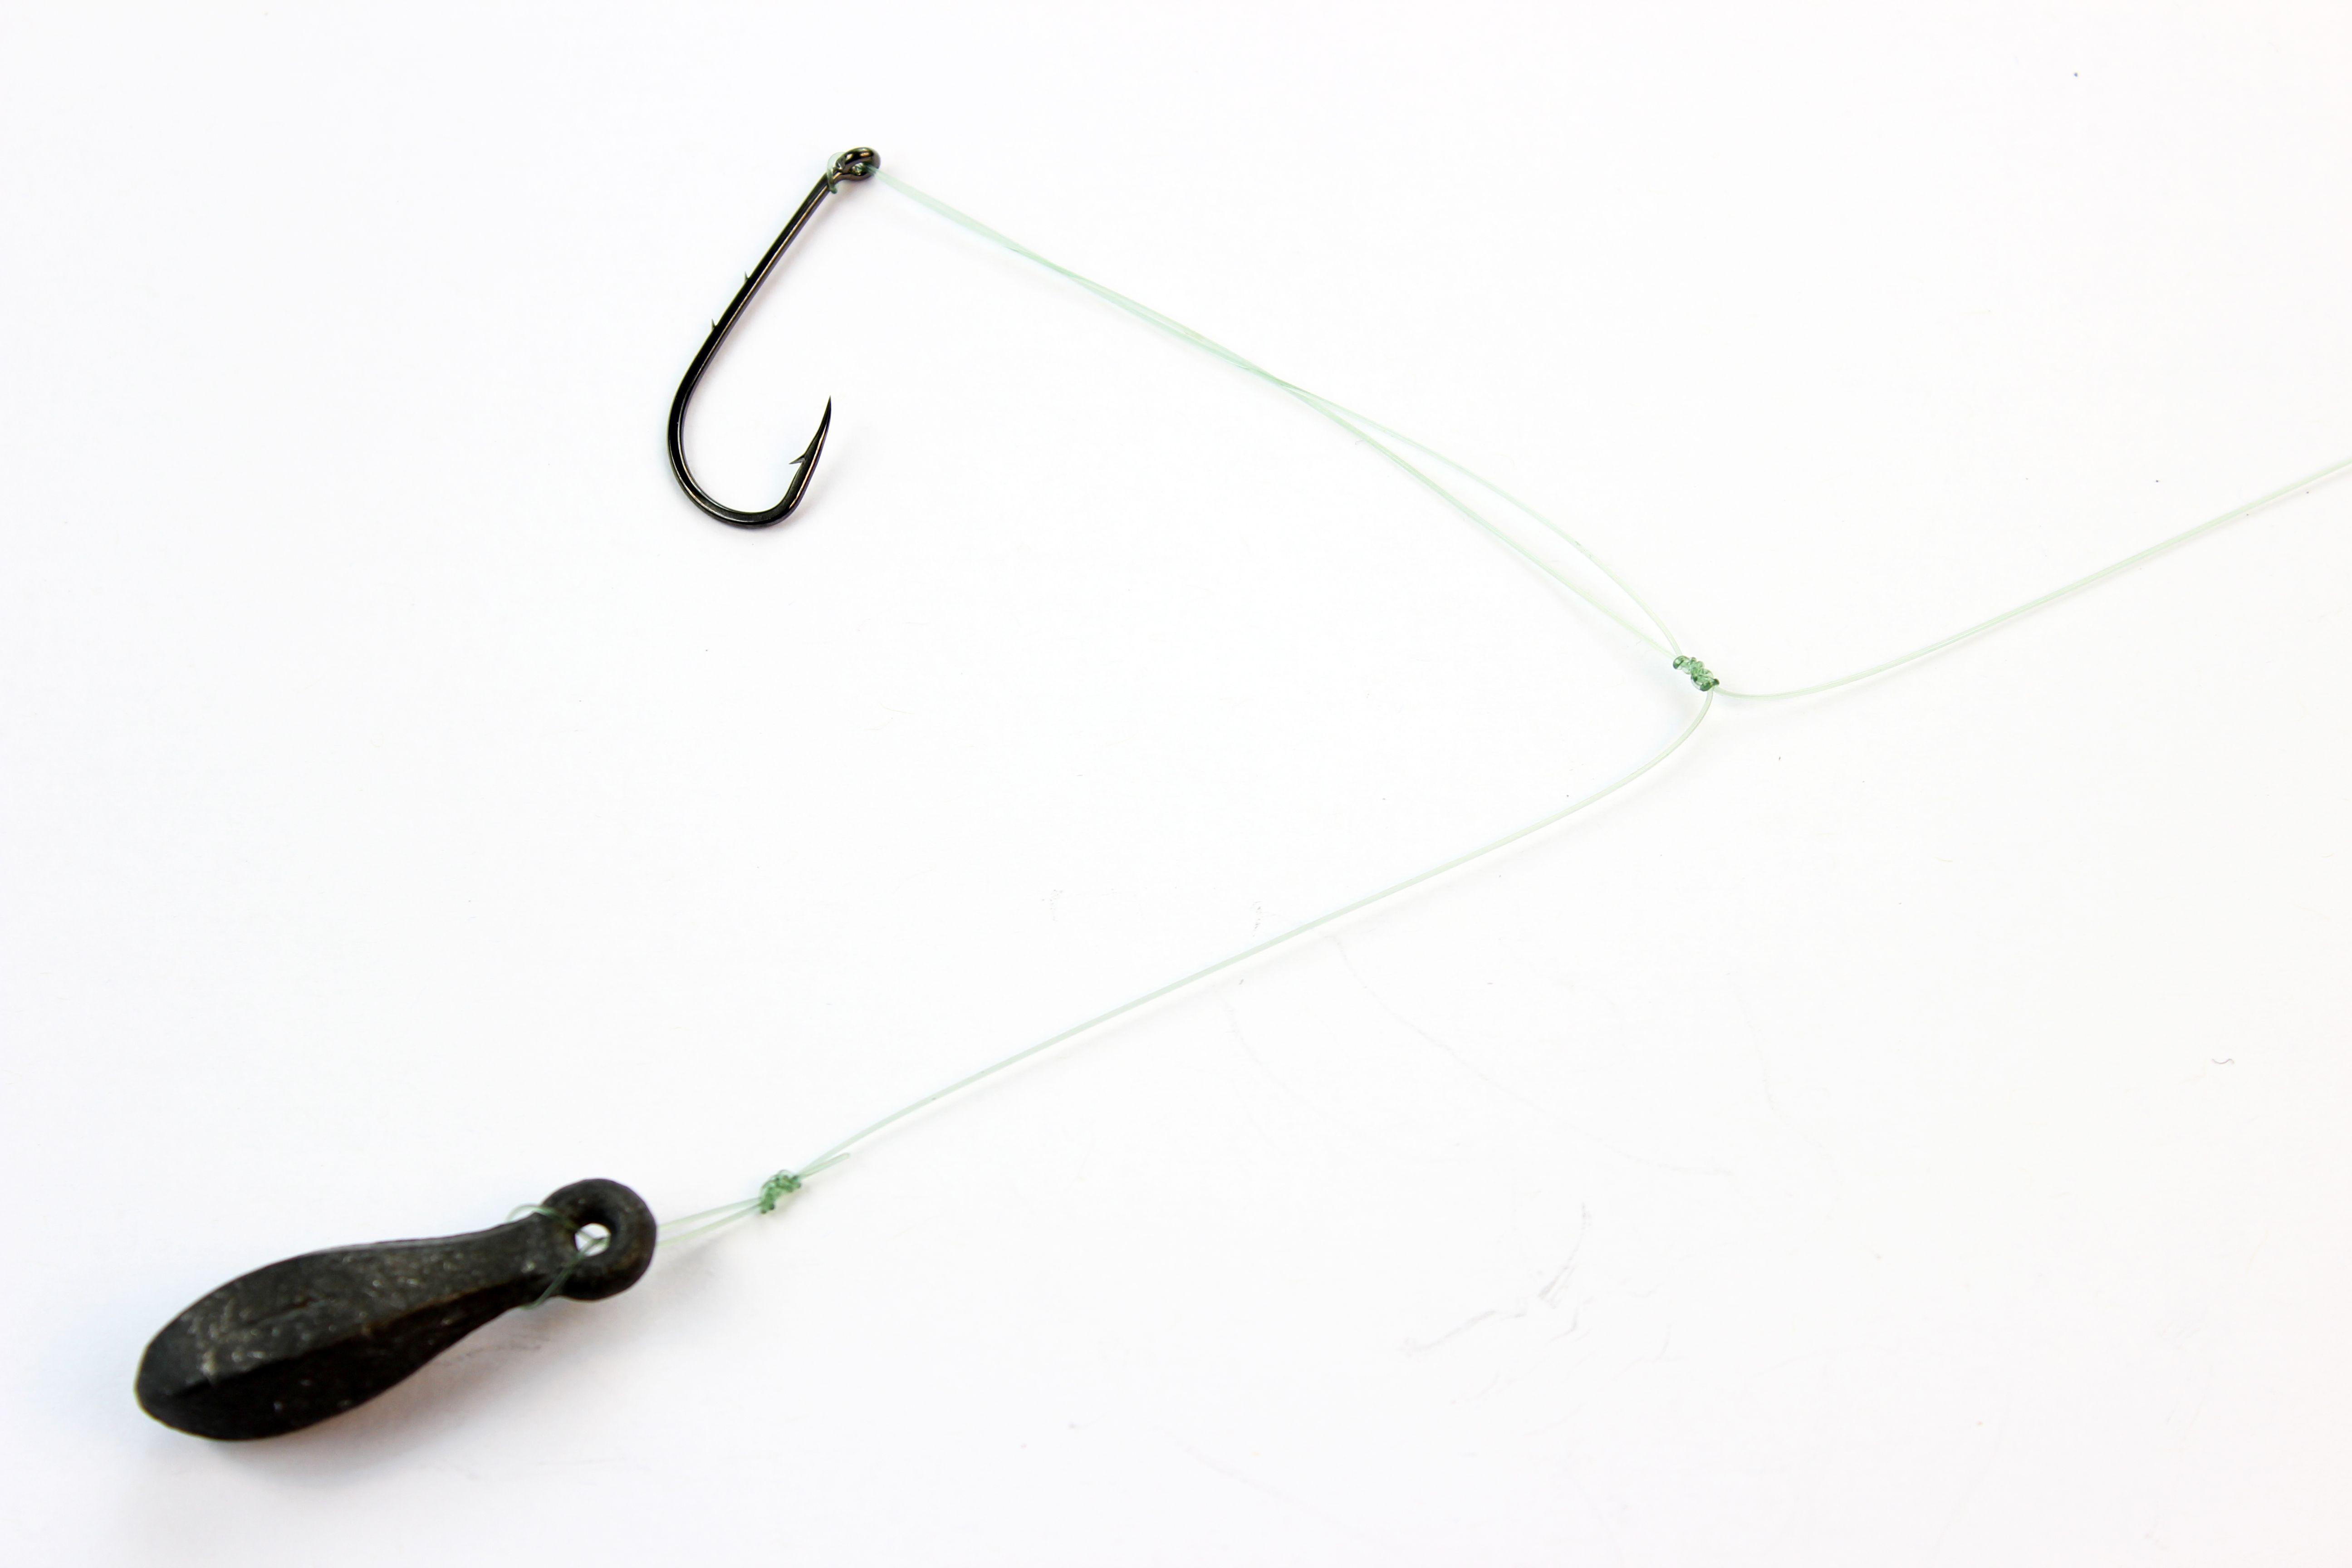 Outdoor Fishing Swivel Carp Hook Sleeve Tackle Carp Fishing Swivels Hooks New FI